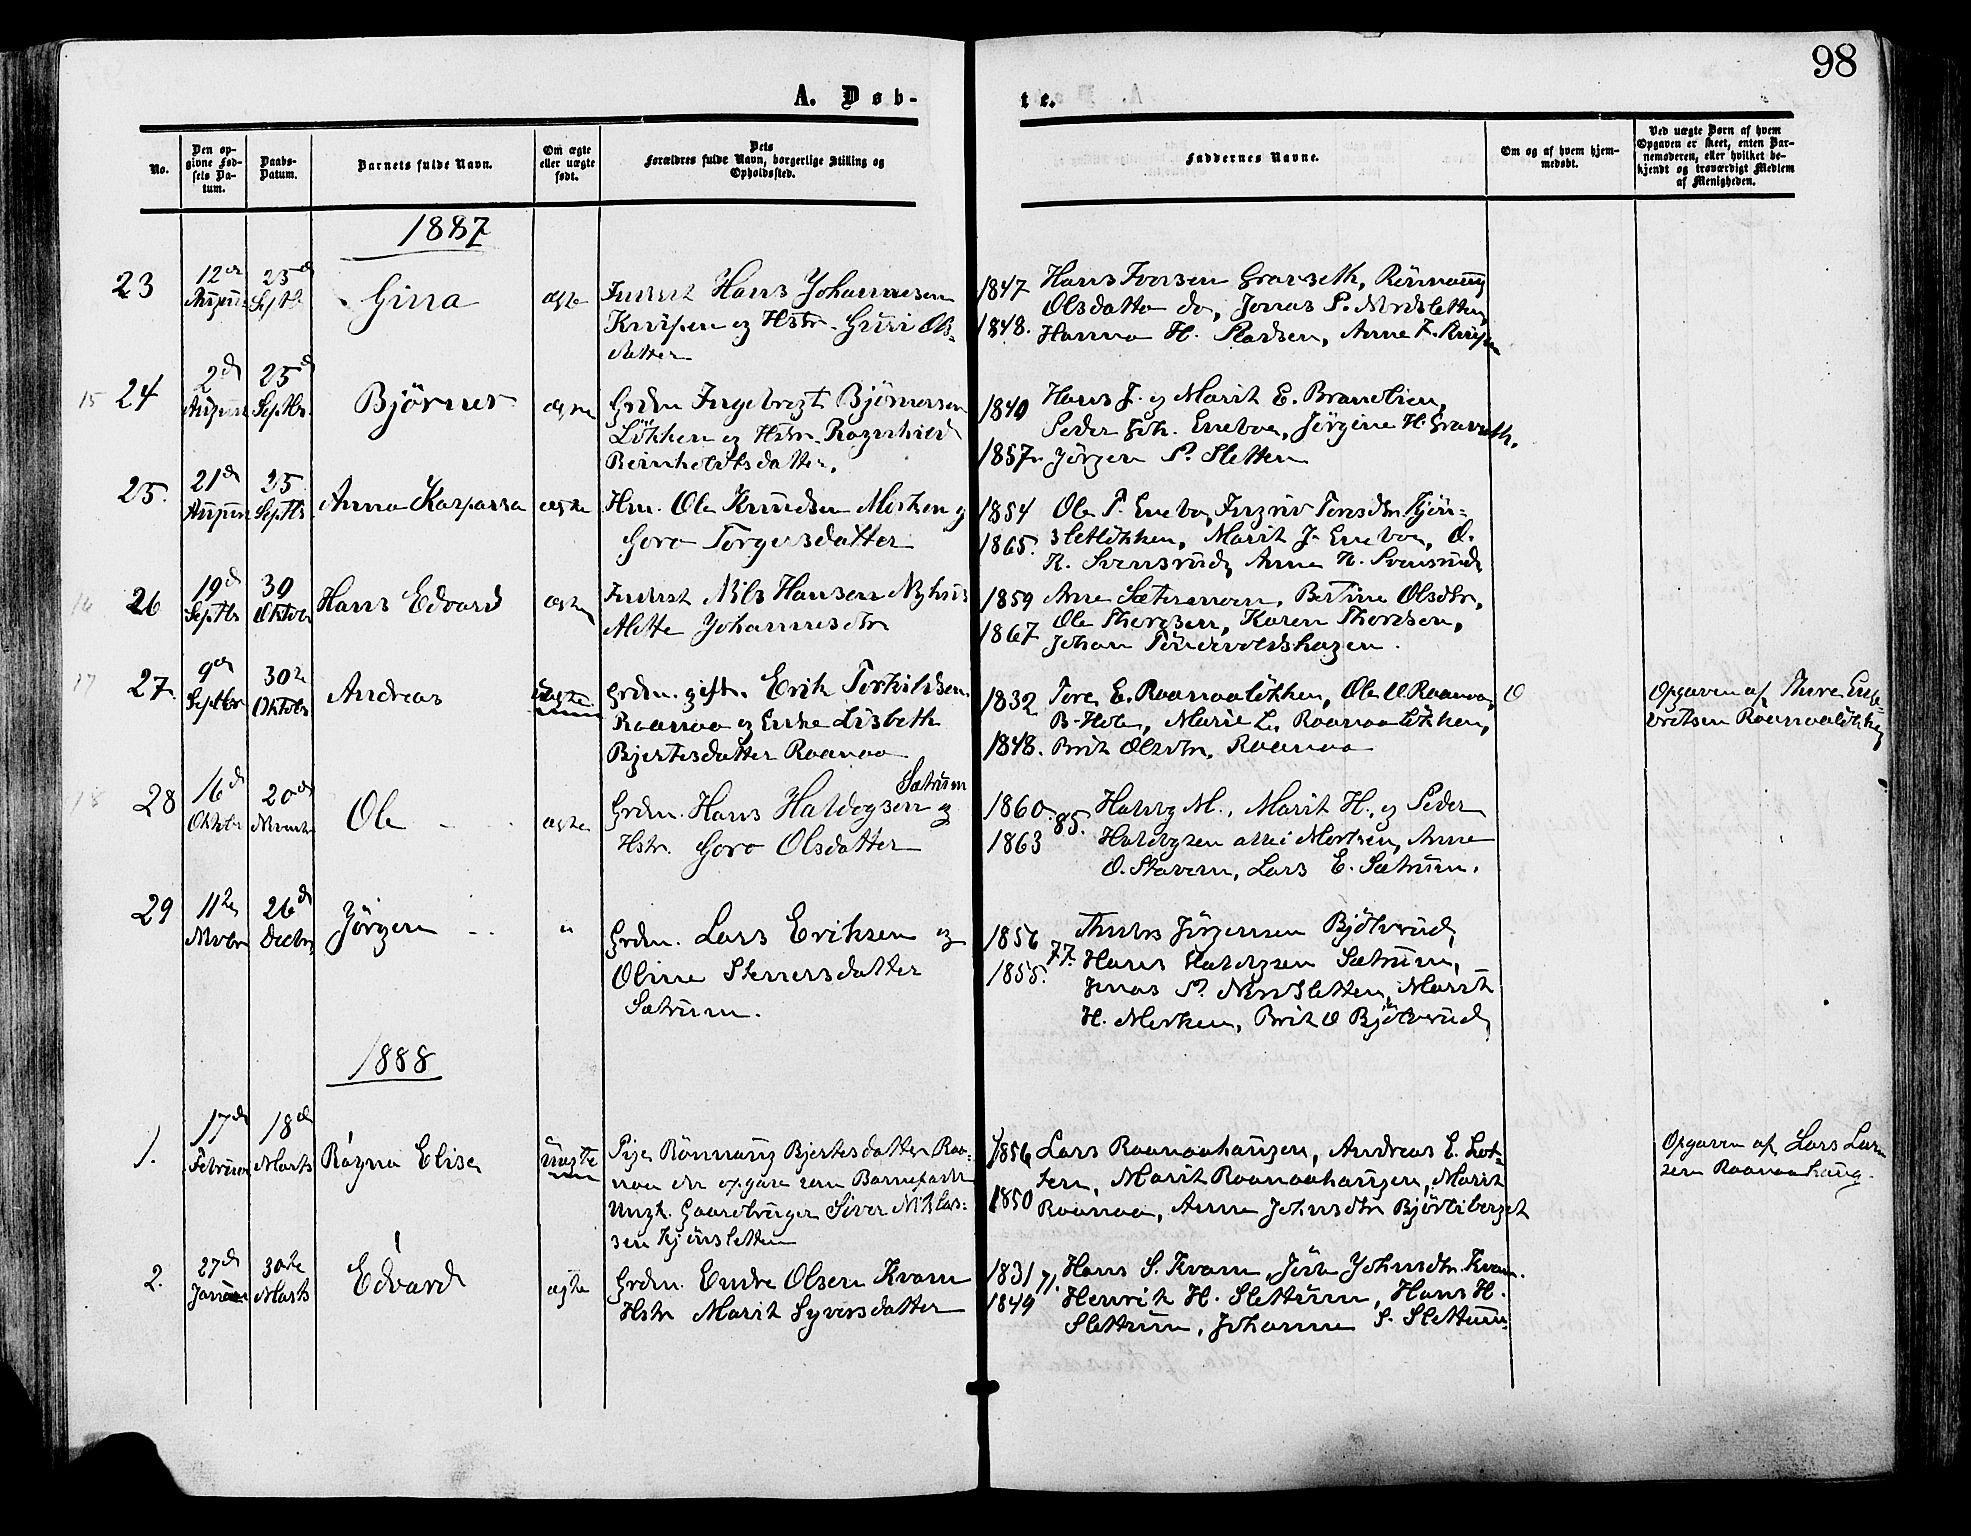 SAH, Lesja prestekontor, Ministerialbok nr. 9, 1854-1889, s. 98